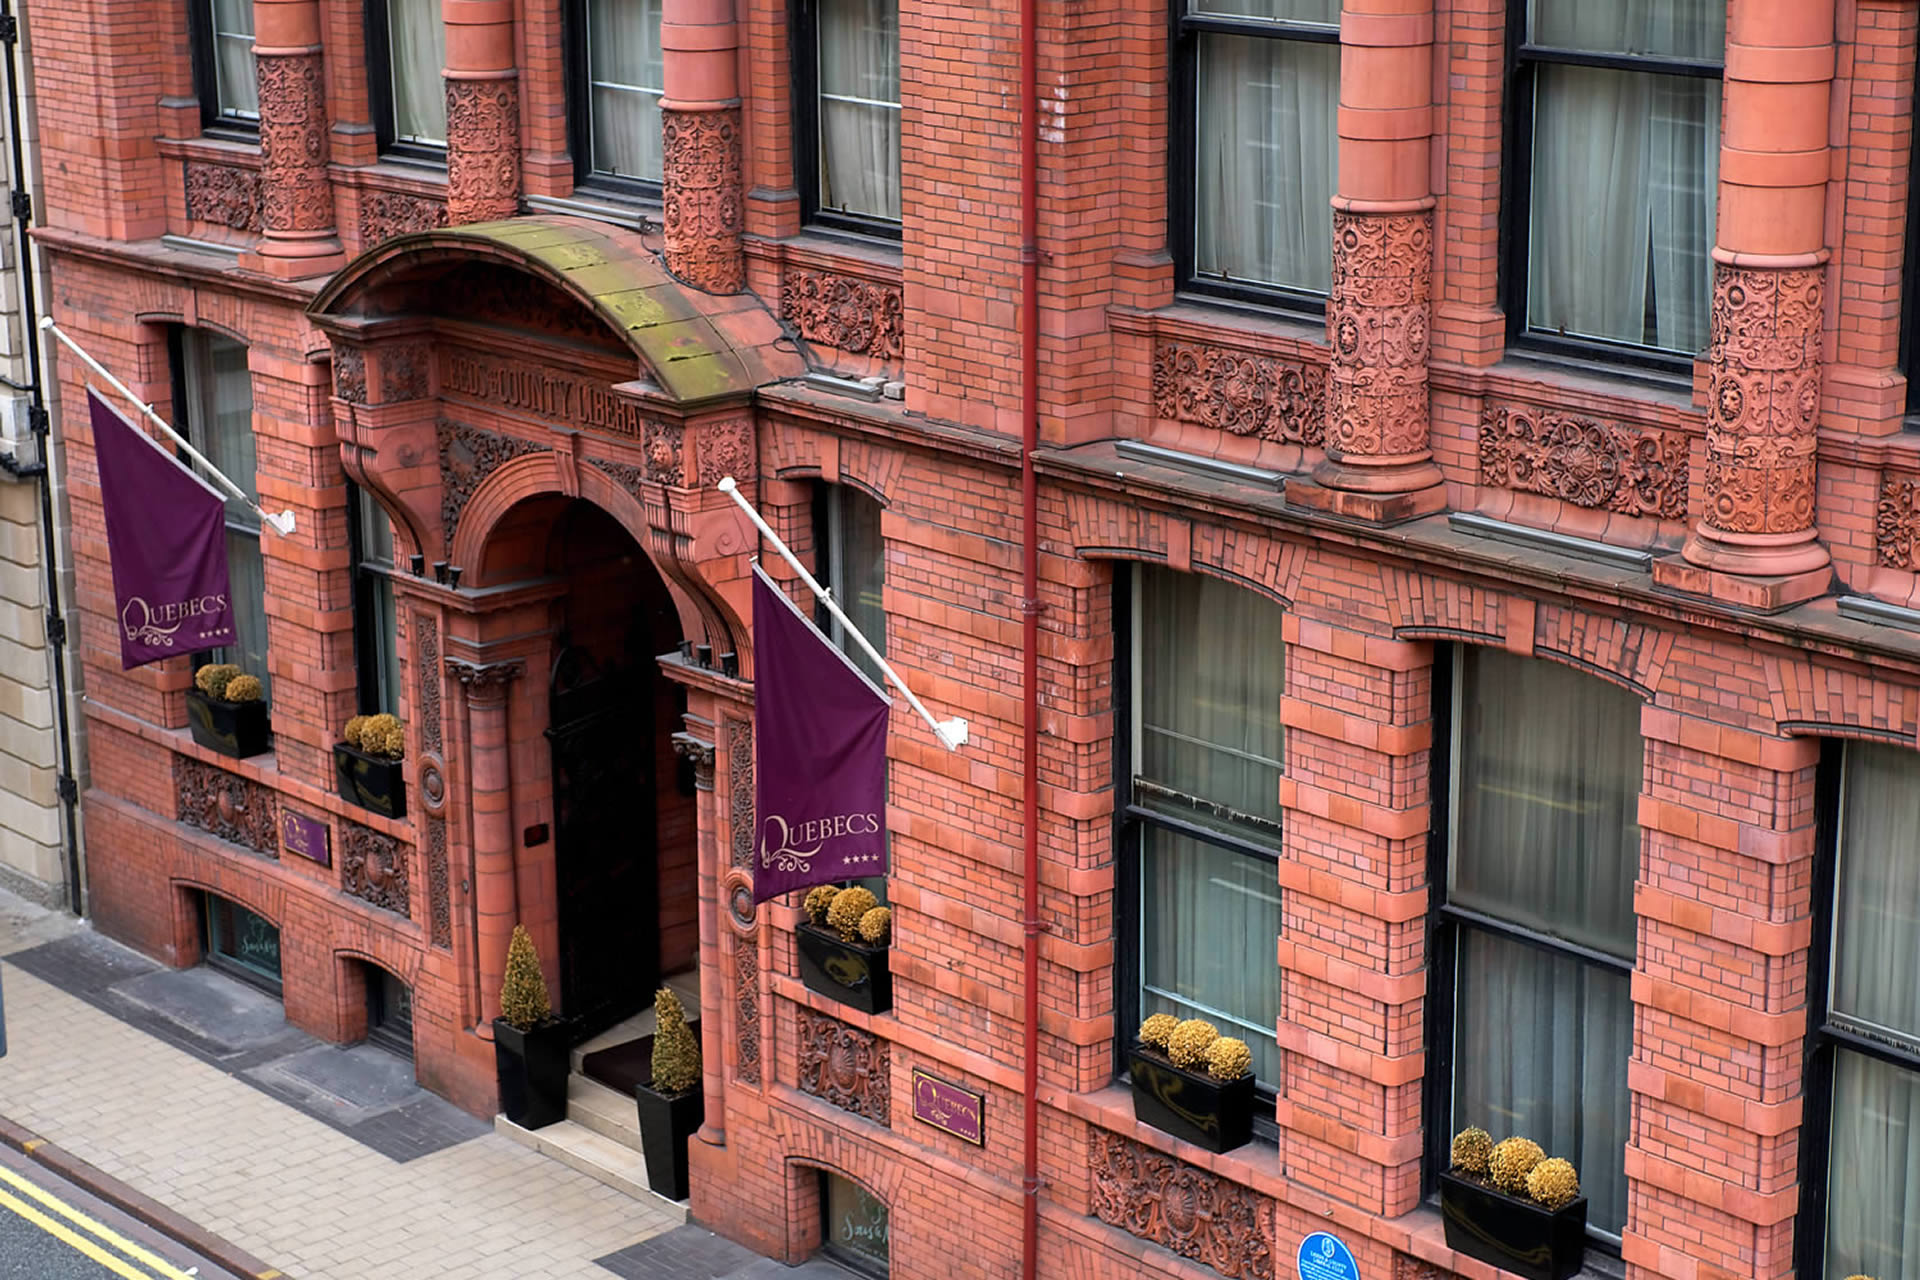 Quebecs hotel leeds red brick